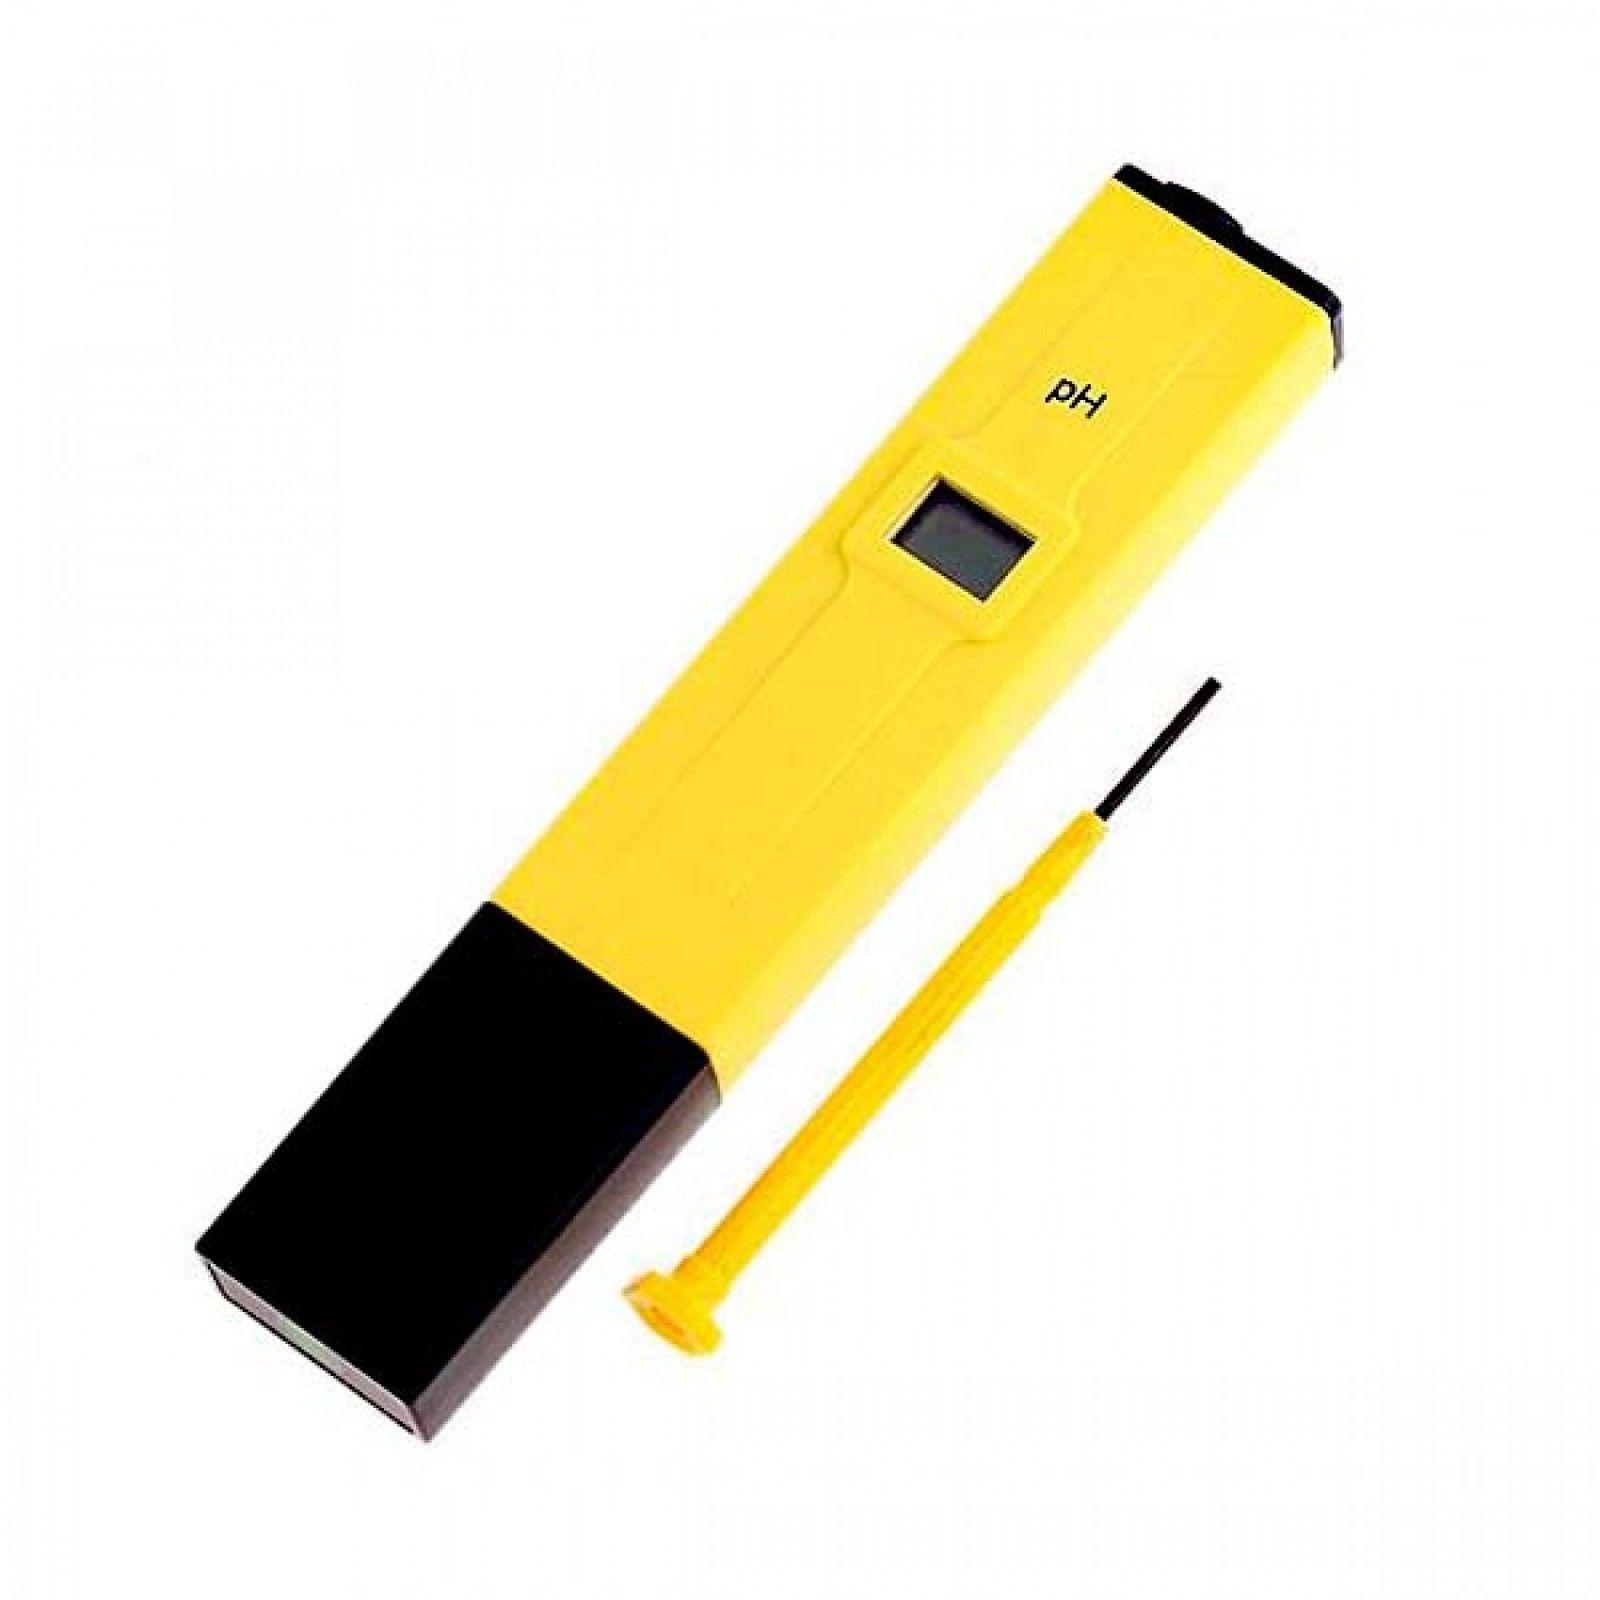 Kabalo Pocket Digital pH Meter